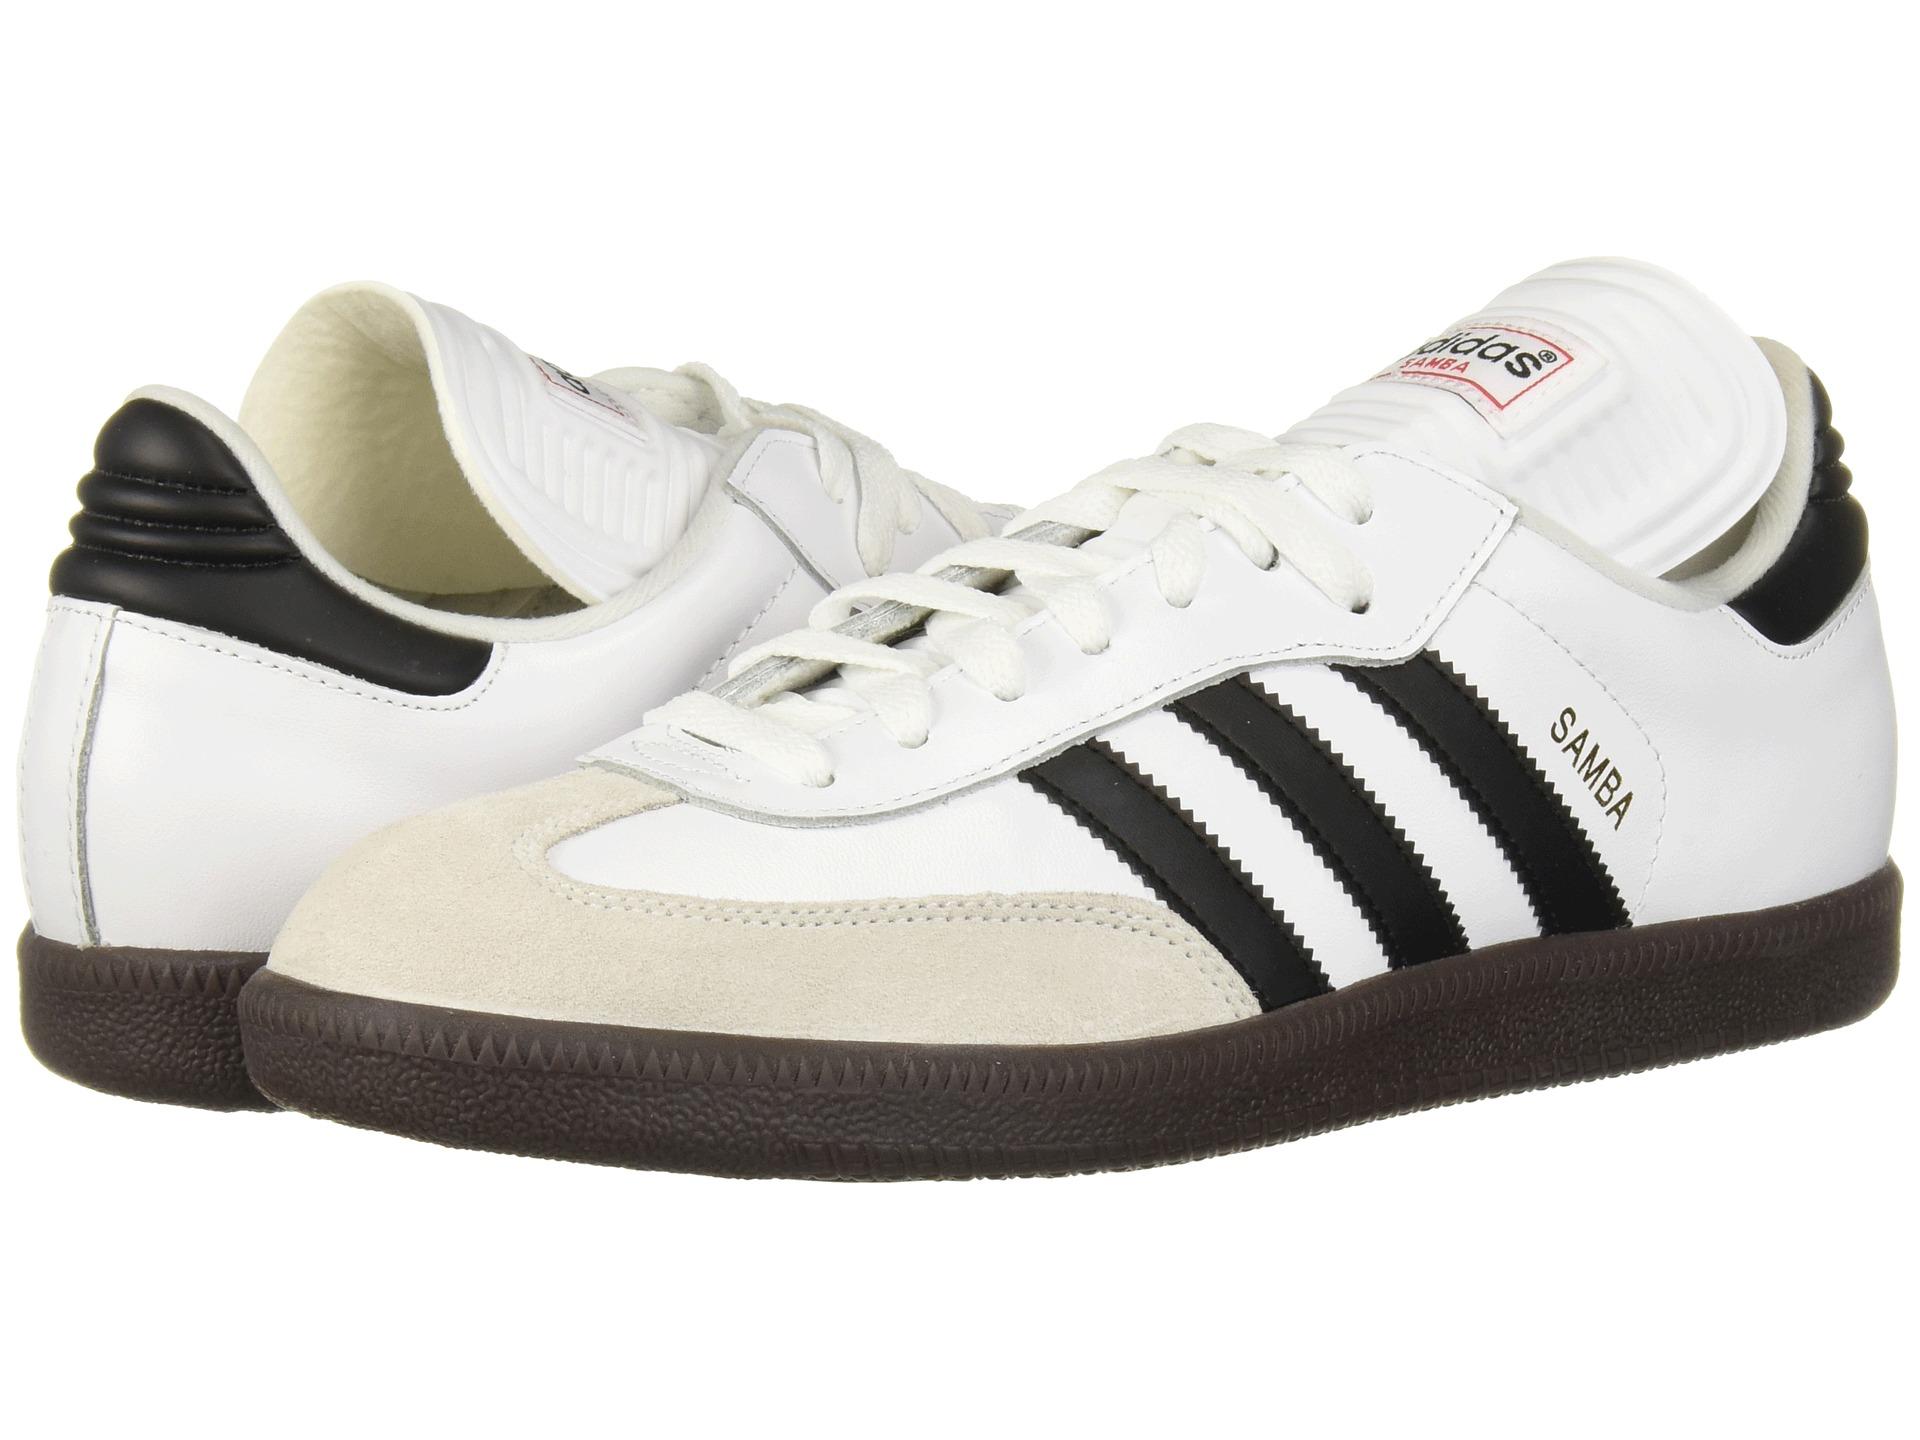 3501f1ff5 Buy adidas samba soccer shoes > OFF63% Discounted